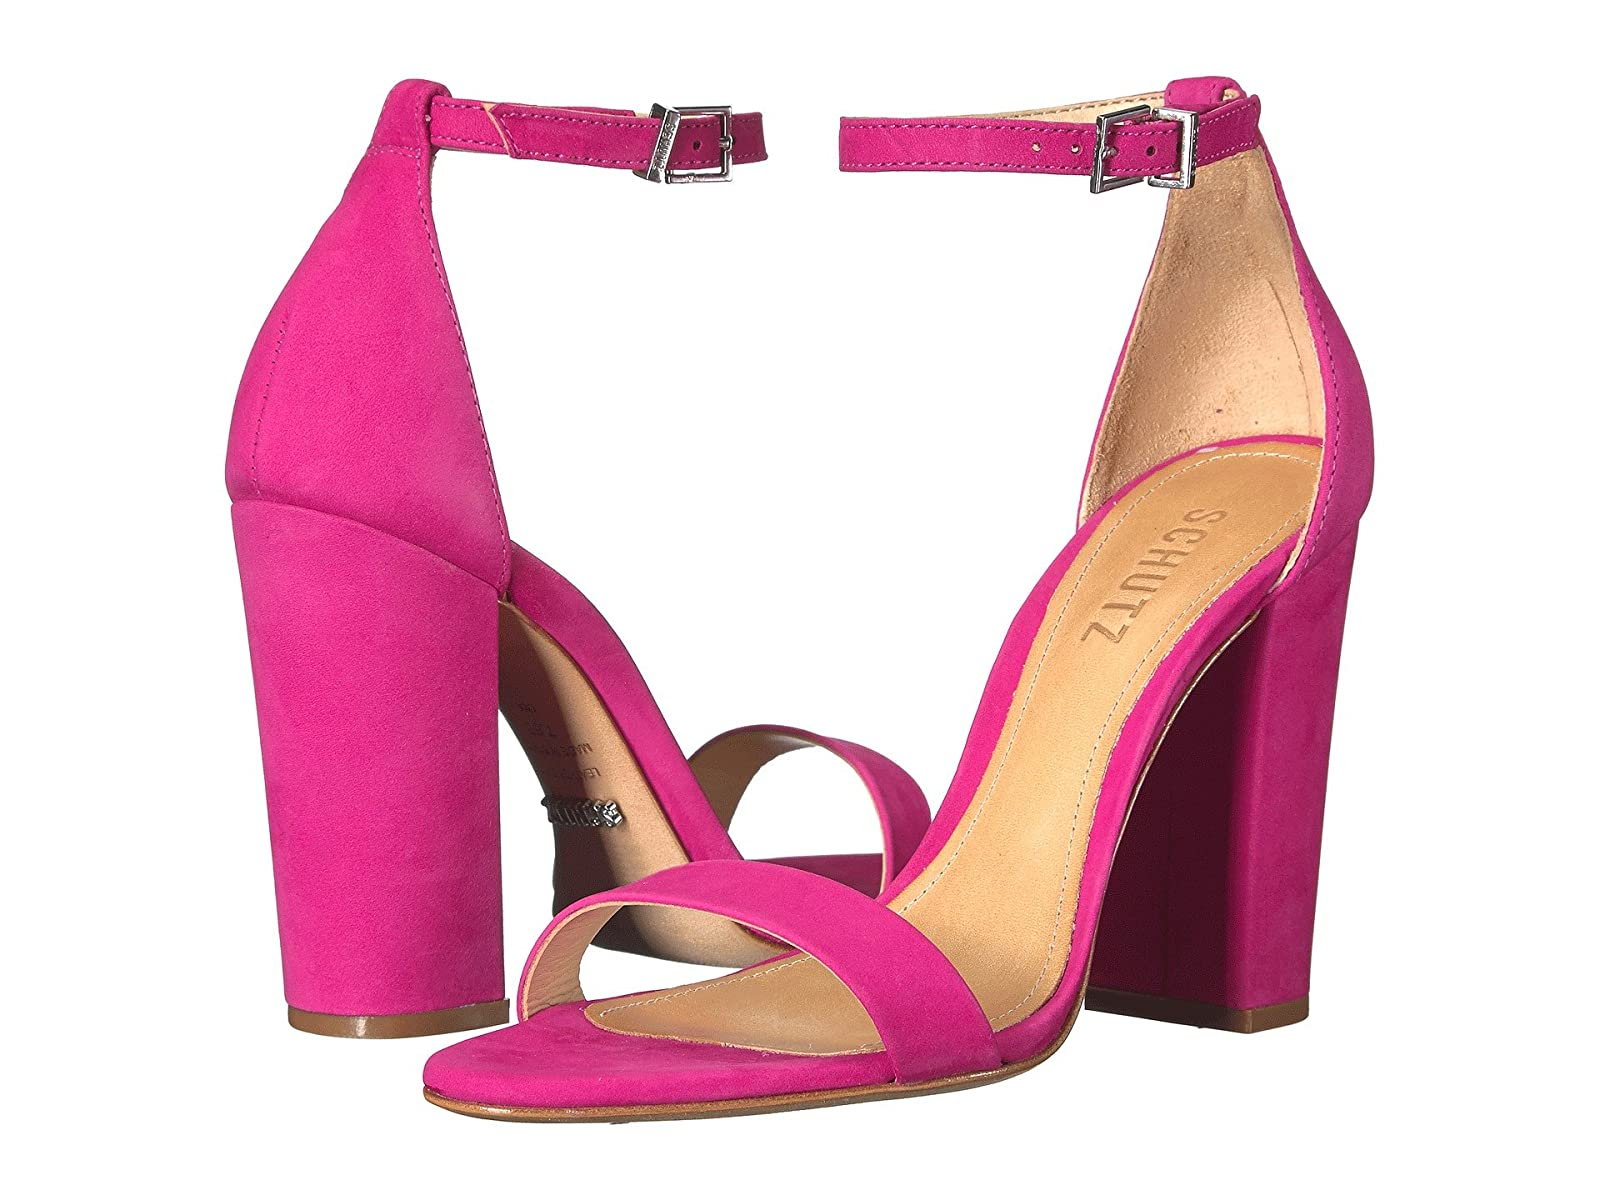 Schutz EnidaCheap and distinctive eye-catching shoes